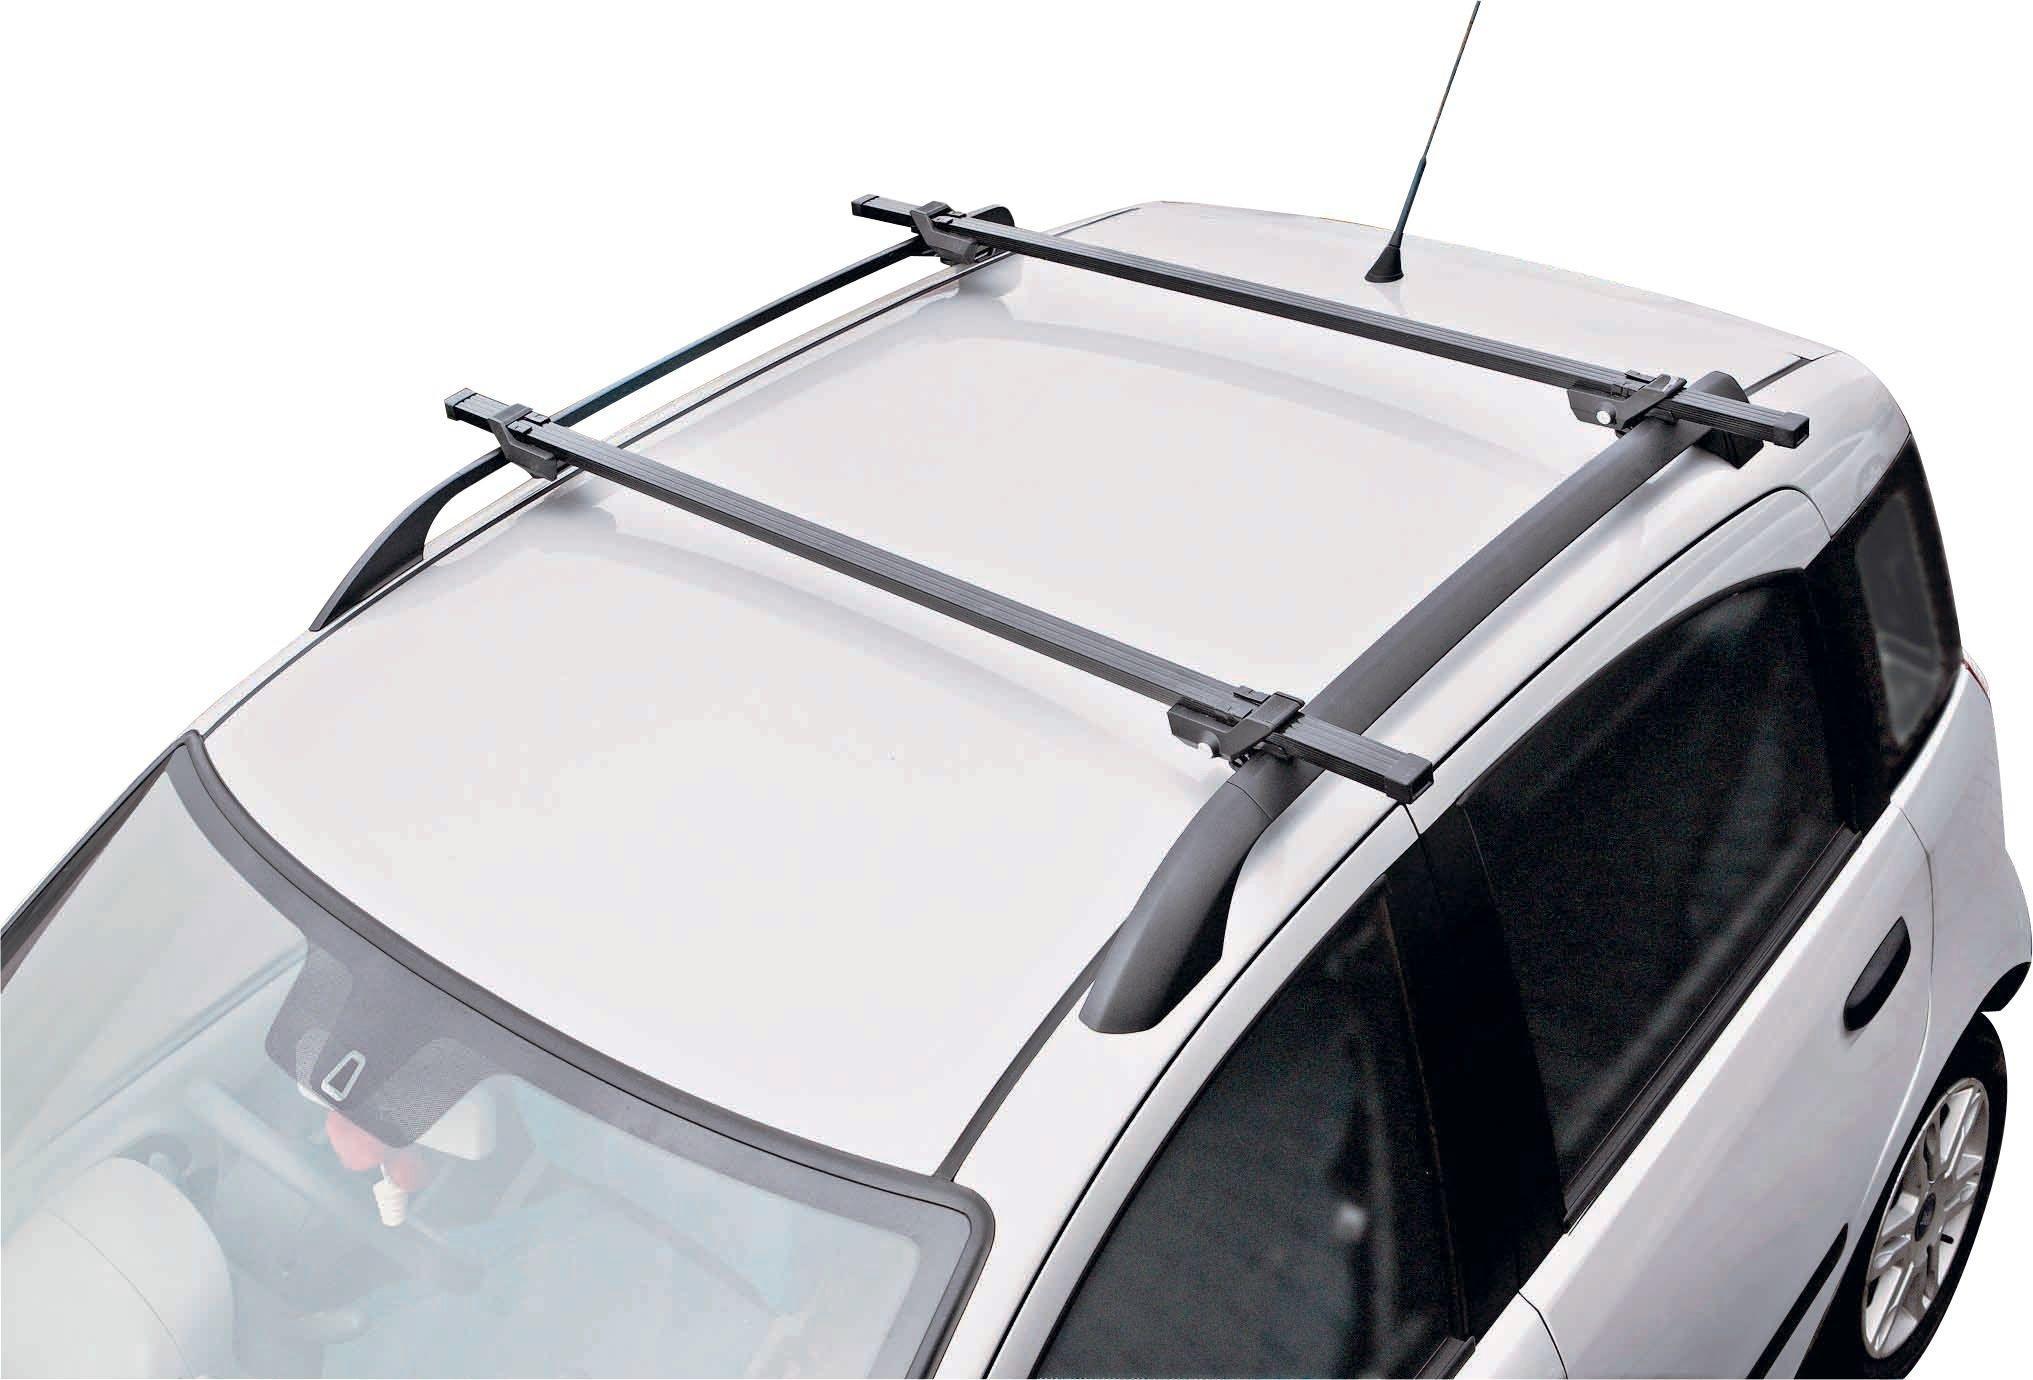 Heavy Duty Lockable Car Roof Bars